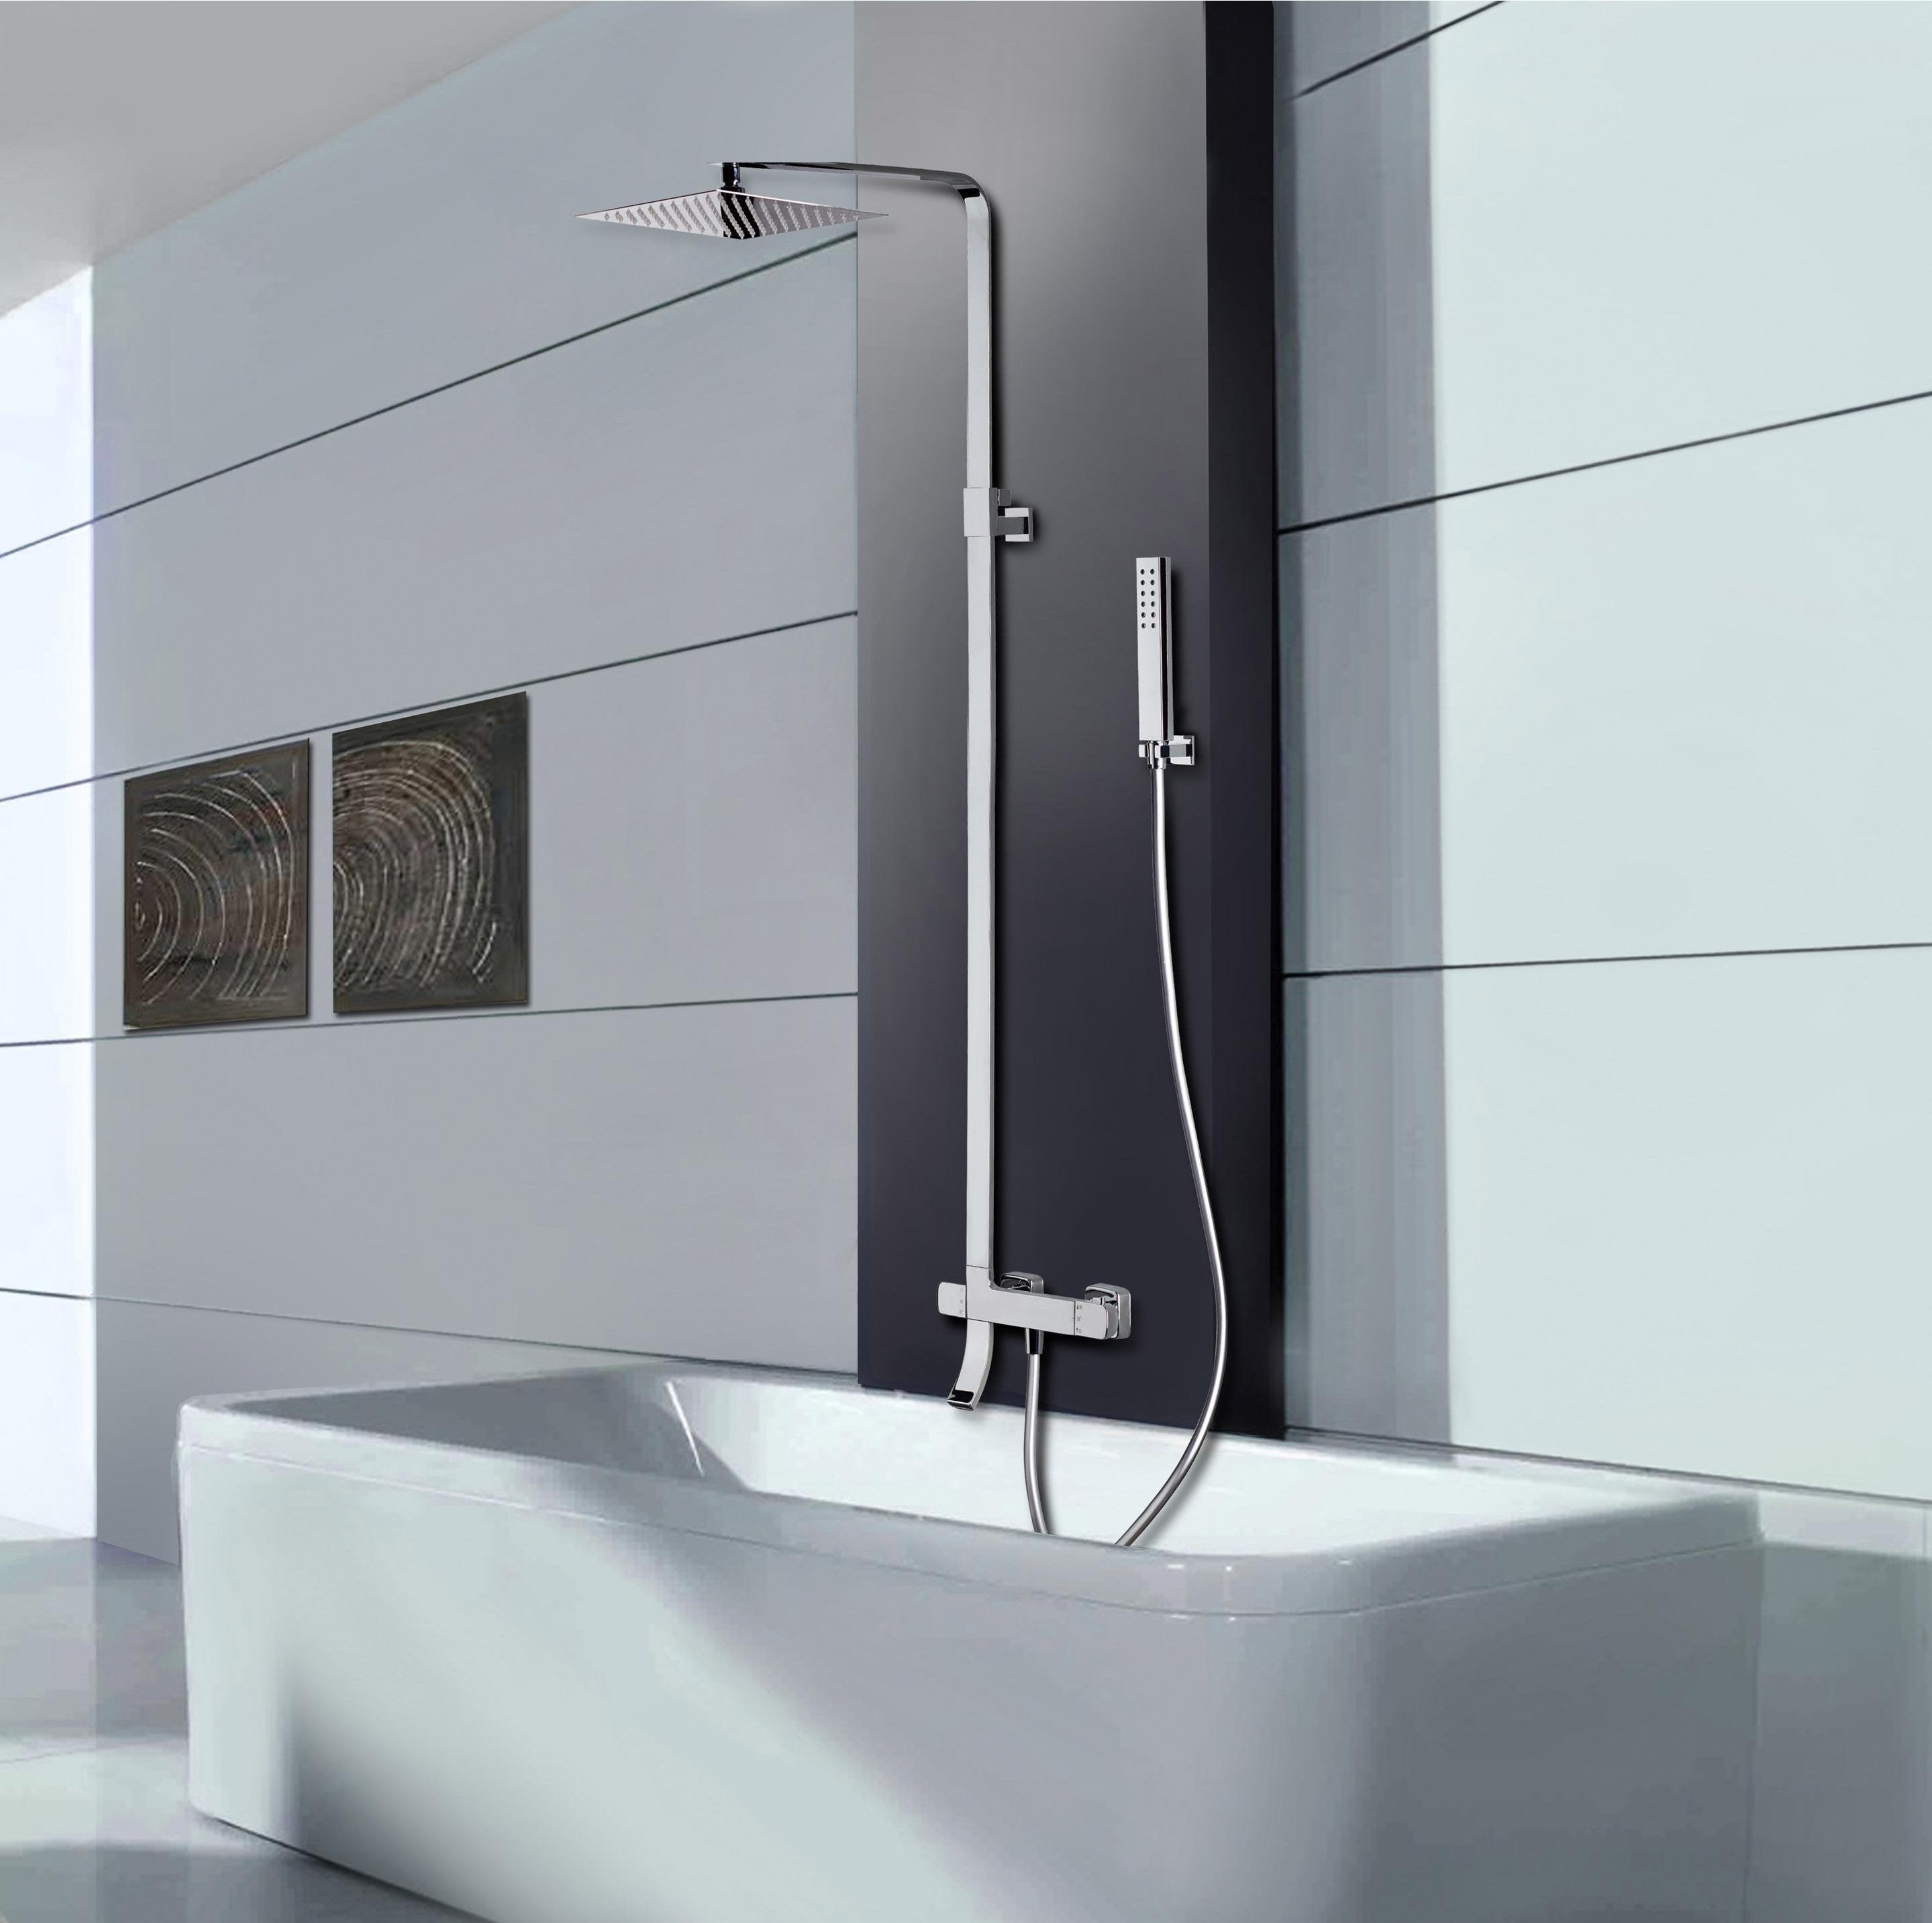 Colonne de bain avec robinetterie, SARODIS Slim